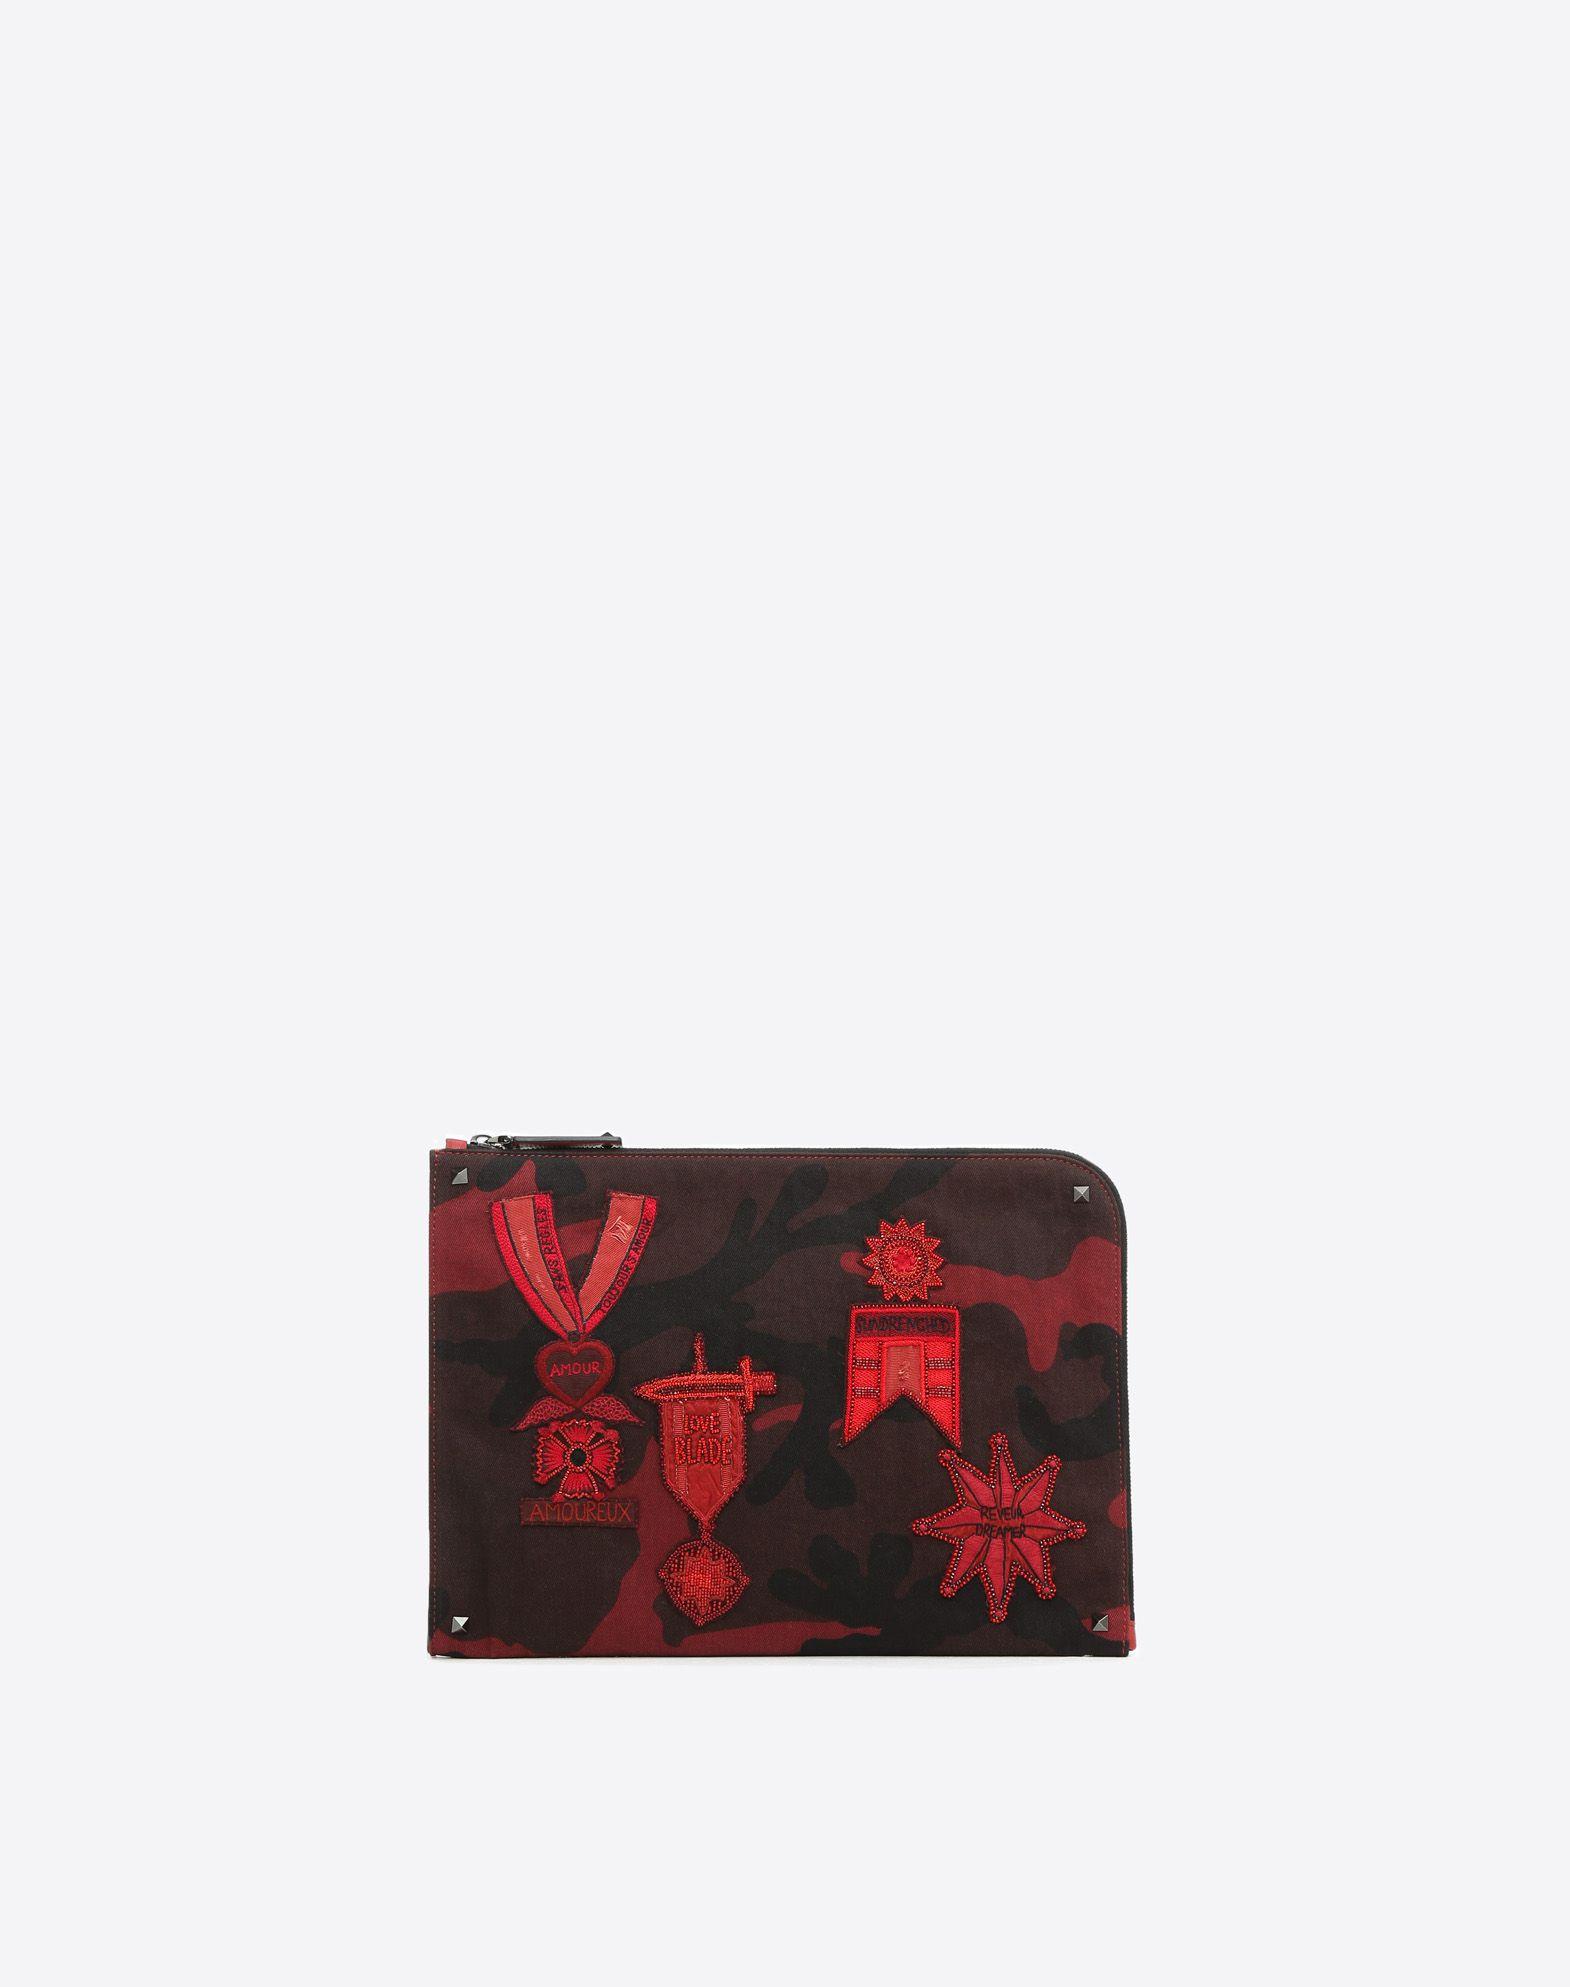 VALENTINO 华达呢 附品牌标志 钉珠 细节对比处理 拉链 内部口袋  41780229gc